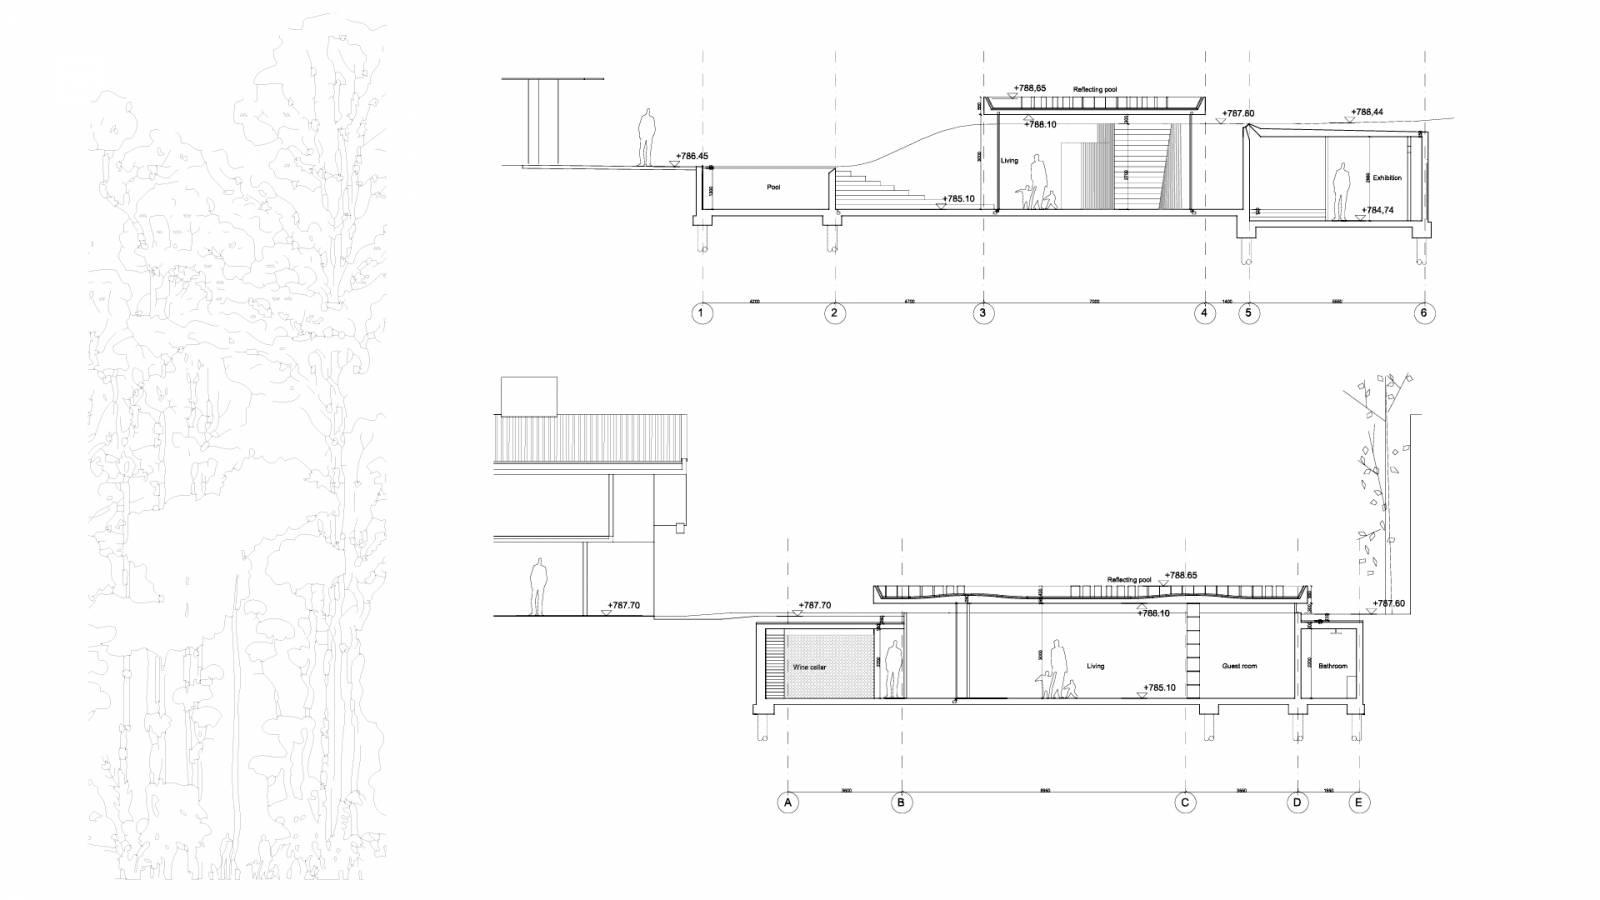 architecture section diagram 1999 ford taurus wiring sao paulo art pavillion spol of sunken architects